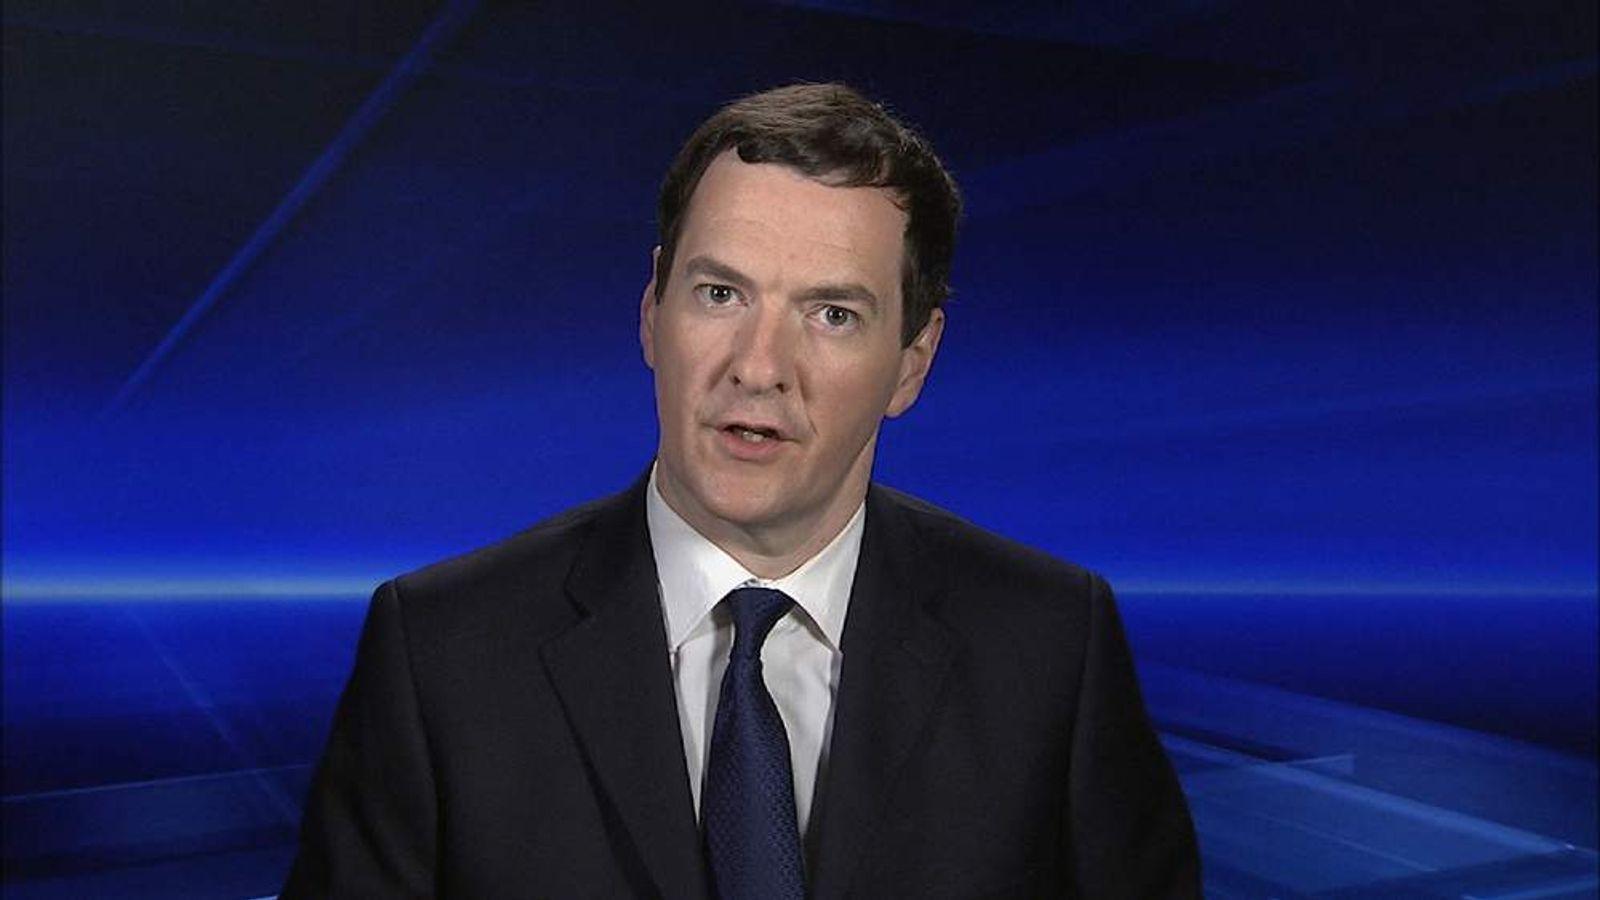 Chancellor George Osborne